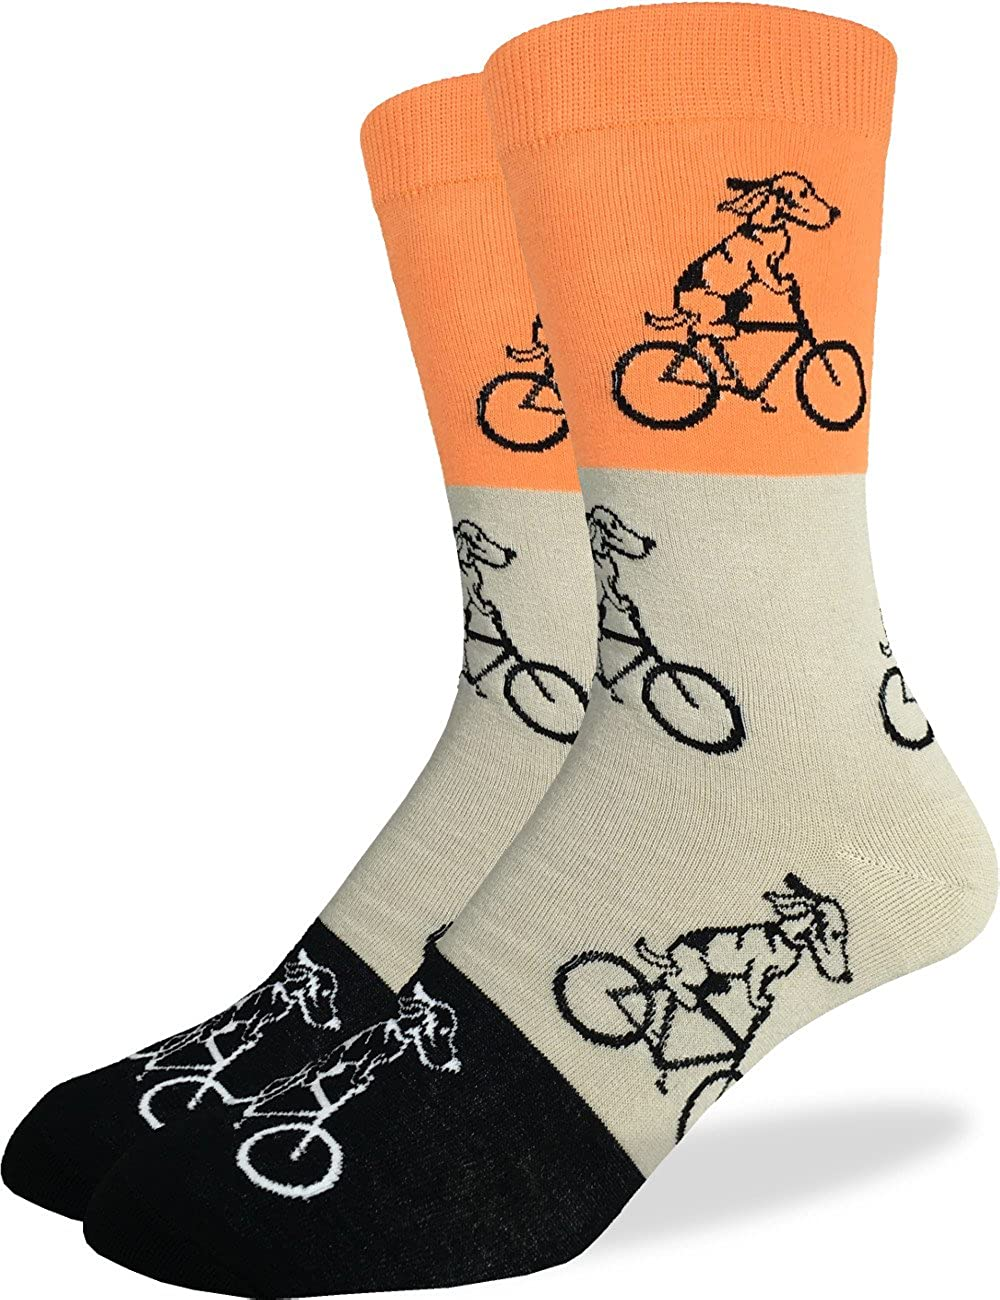 Pumpkin Bat Unisex Funny Casual Crew Socks Athletic Socks For Boys Girls Kids Teenagers